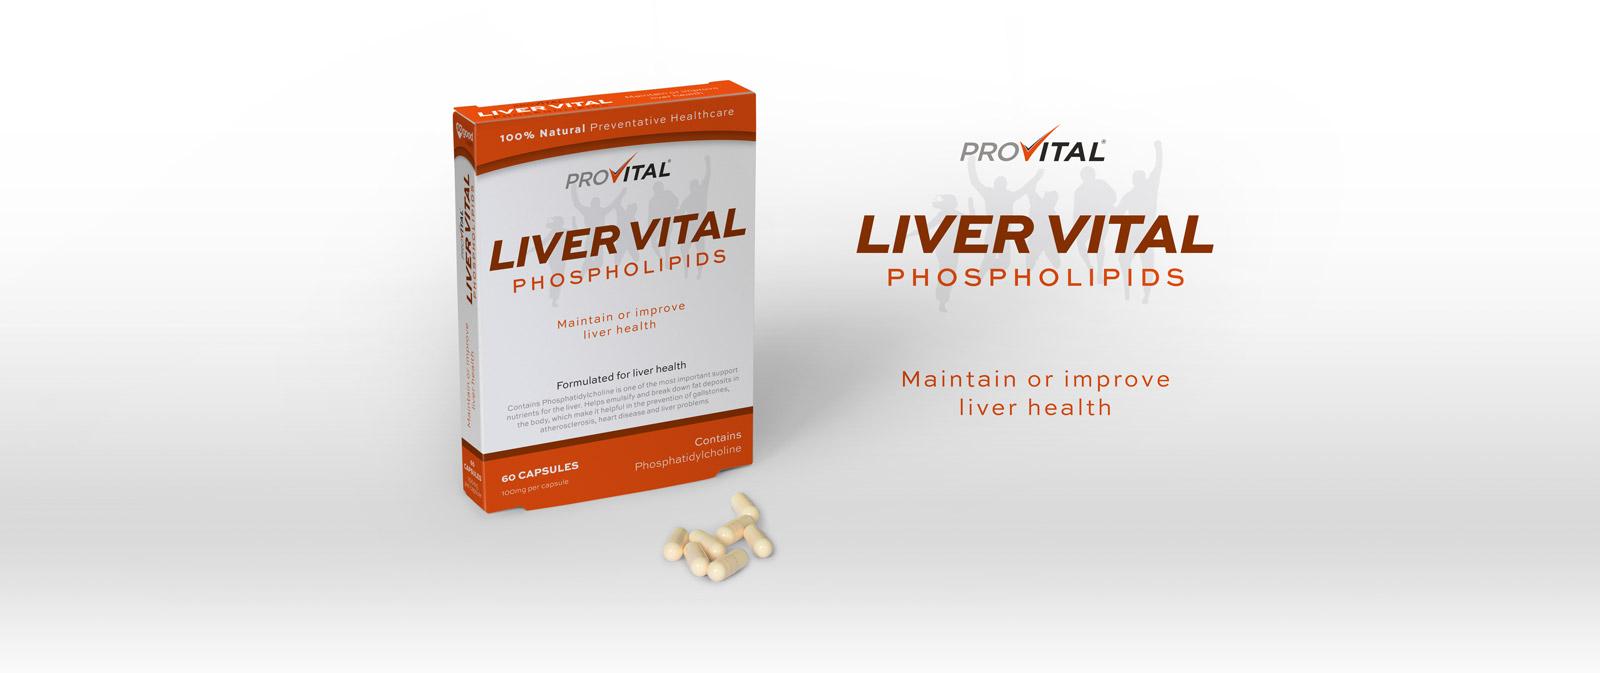 Liver-vital.jpg